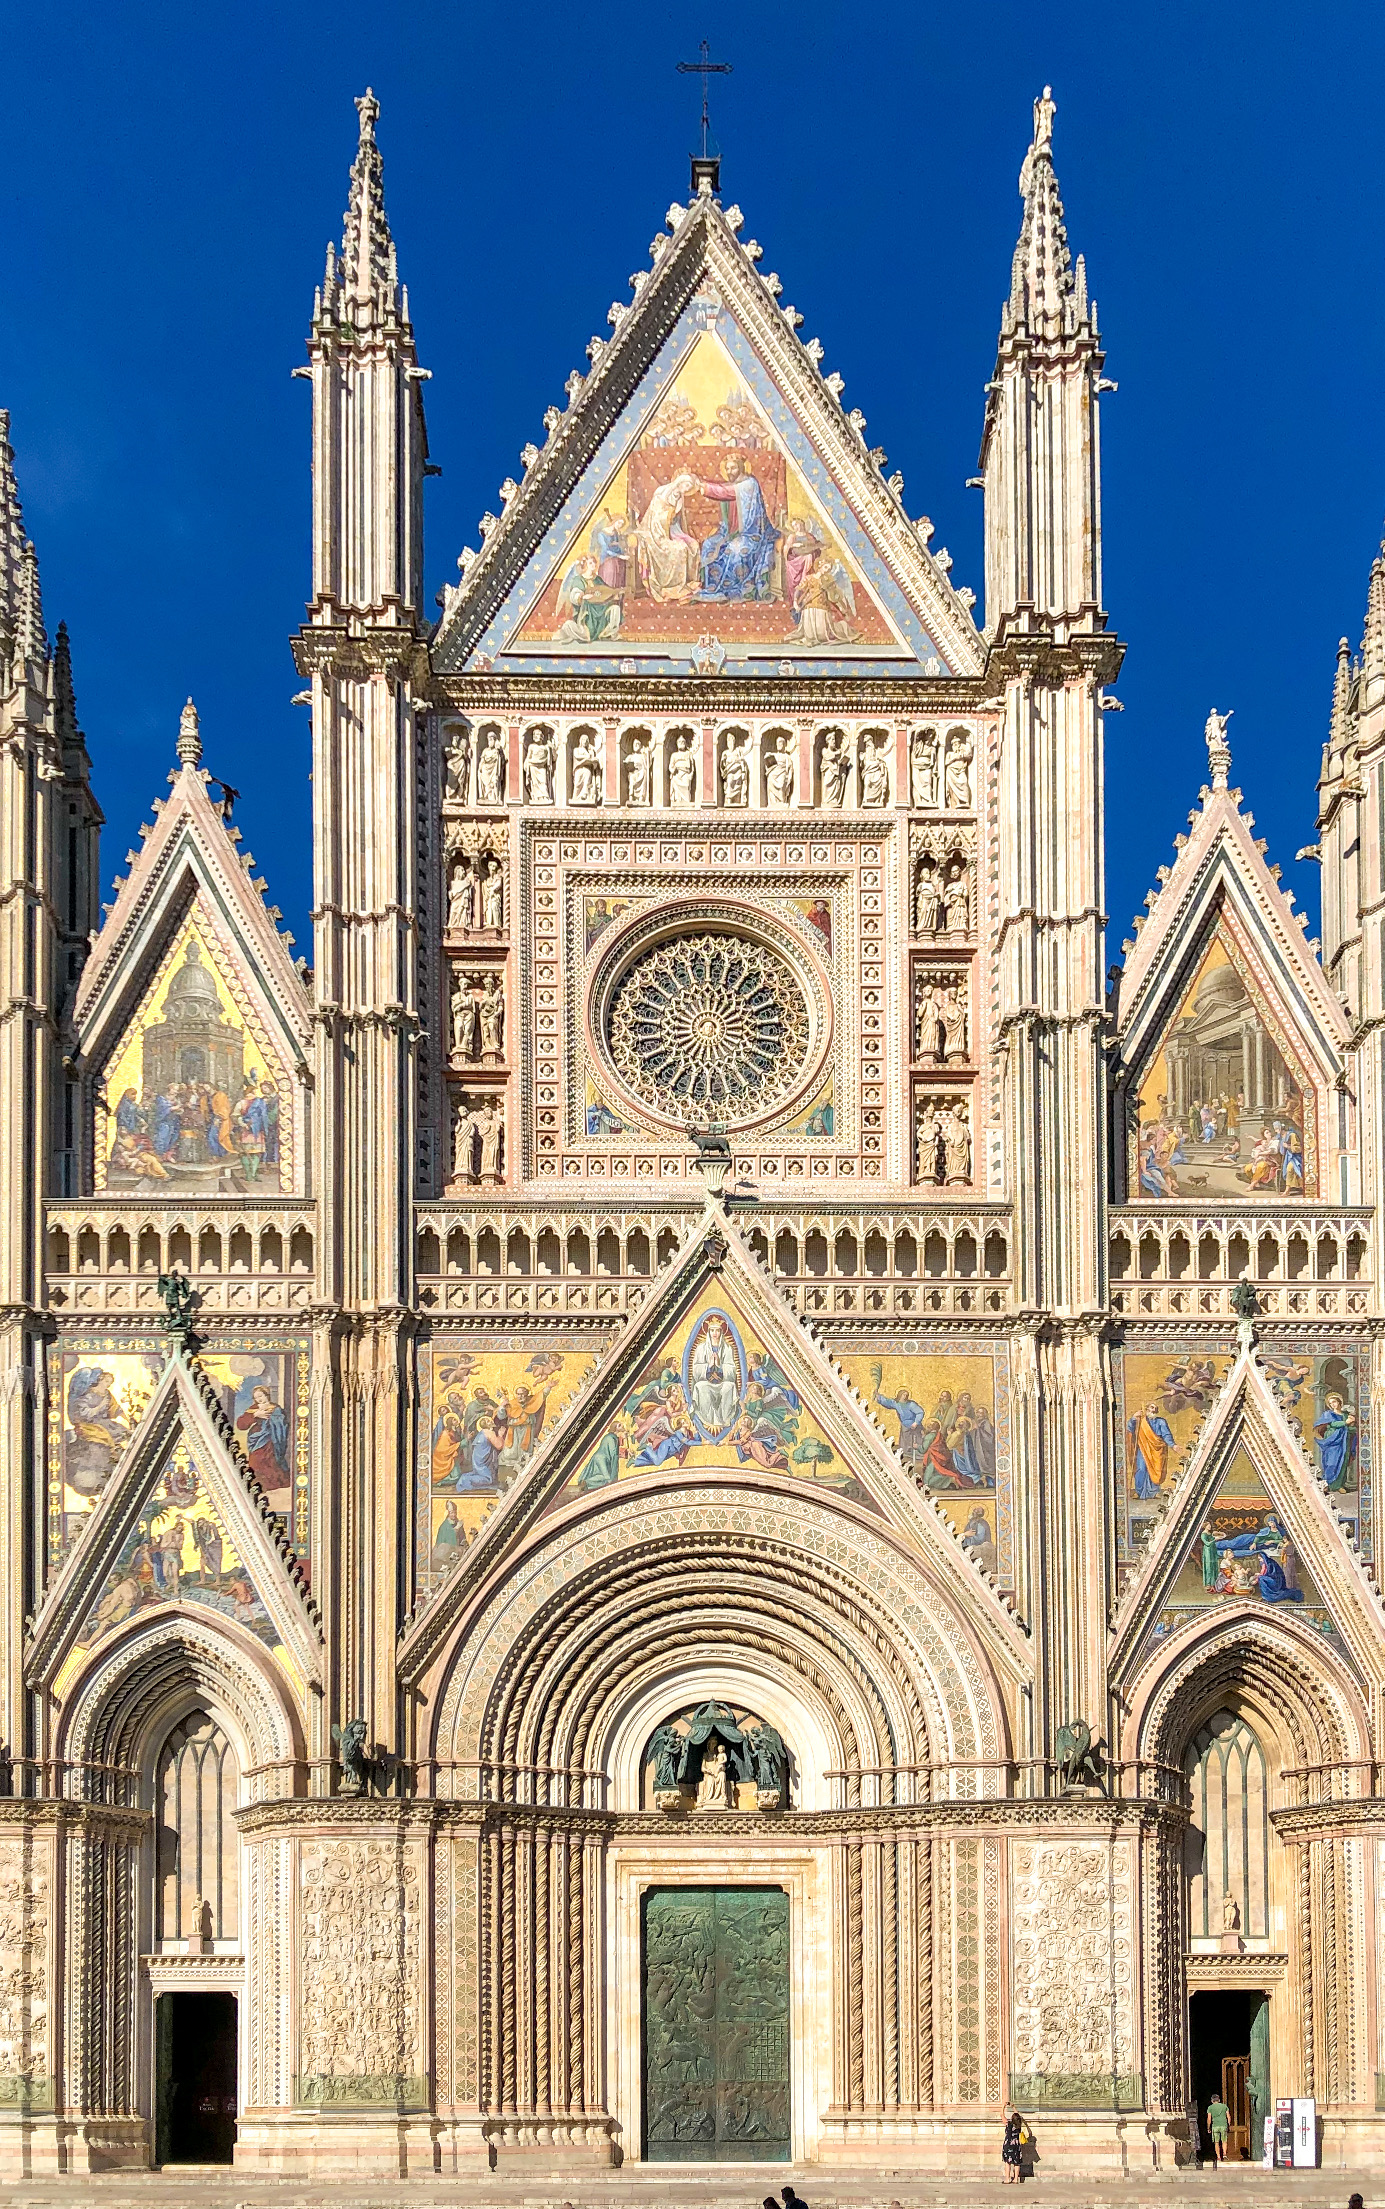 Italia - Italy - Casale Management - Travel - Orvieto - Duomo